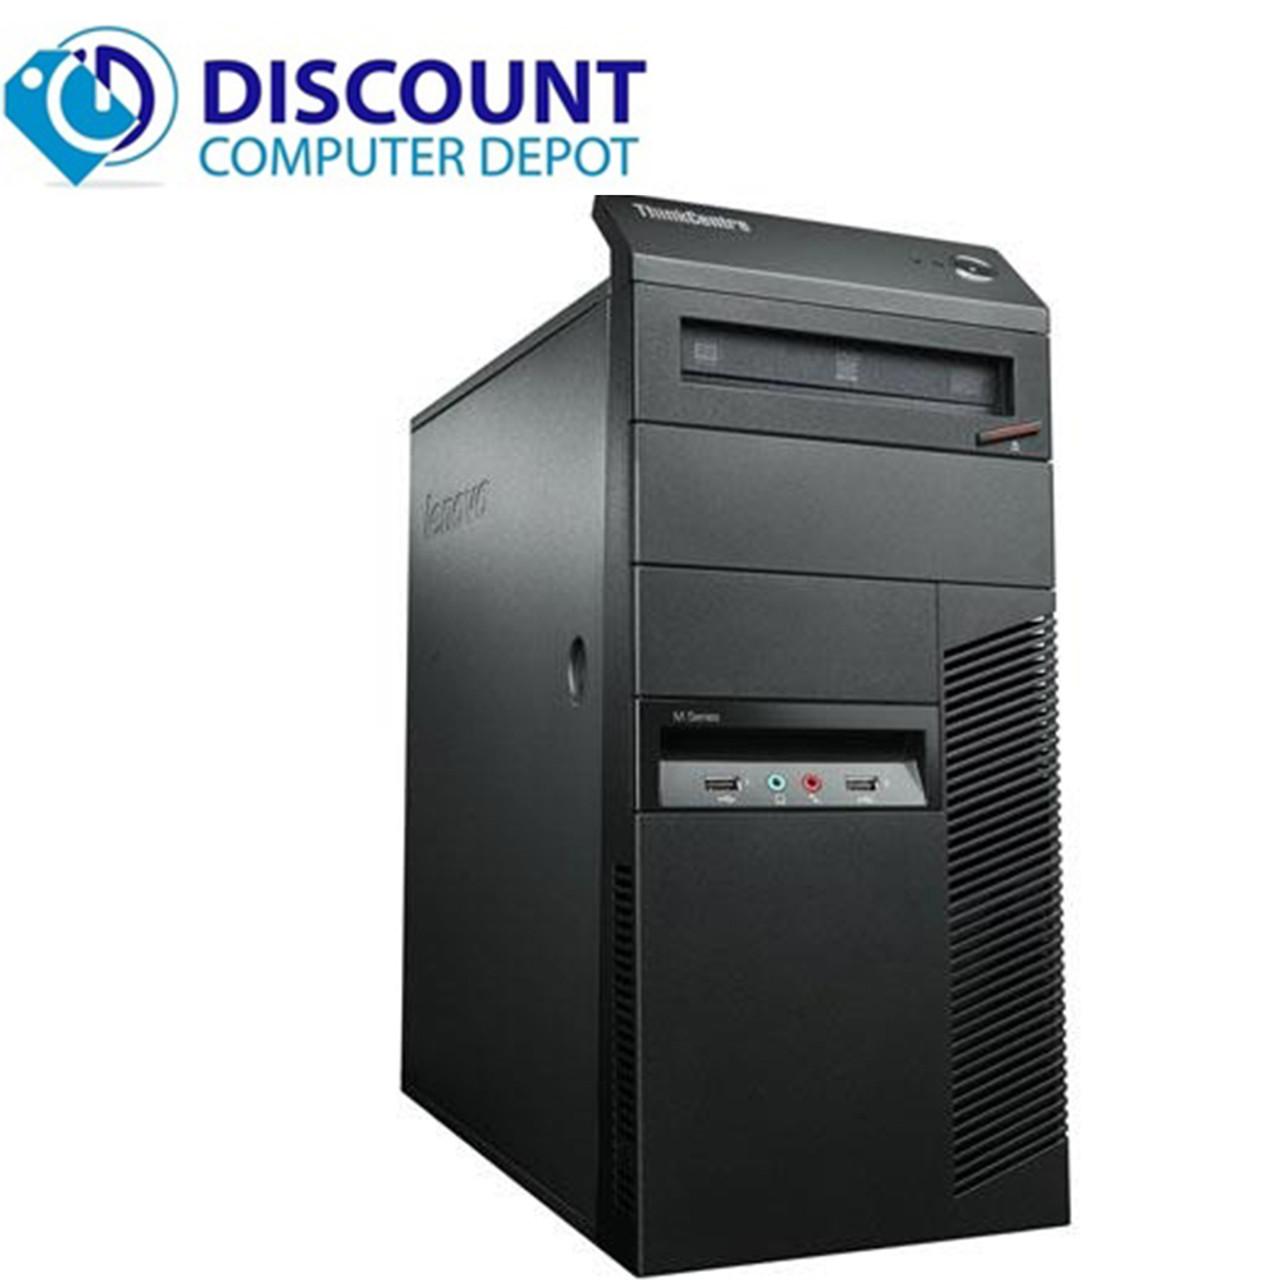 Fast Lenovo Windows 10 Desktop Computer Core i5 Tower 3 2GHz PC 4GB 320GB  Wifi